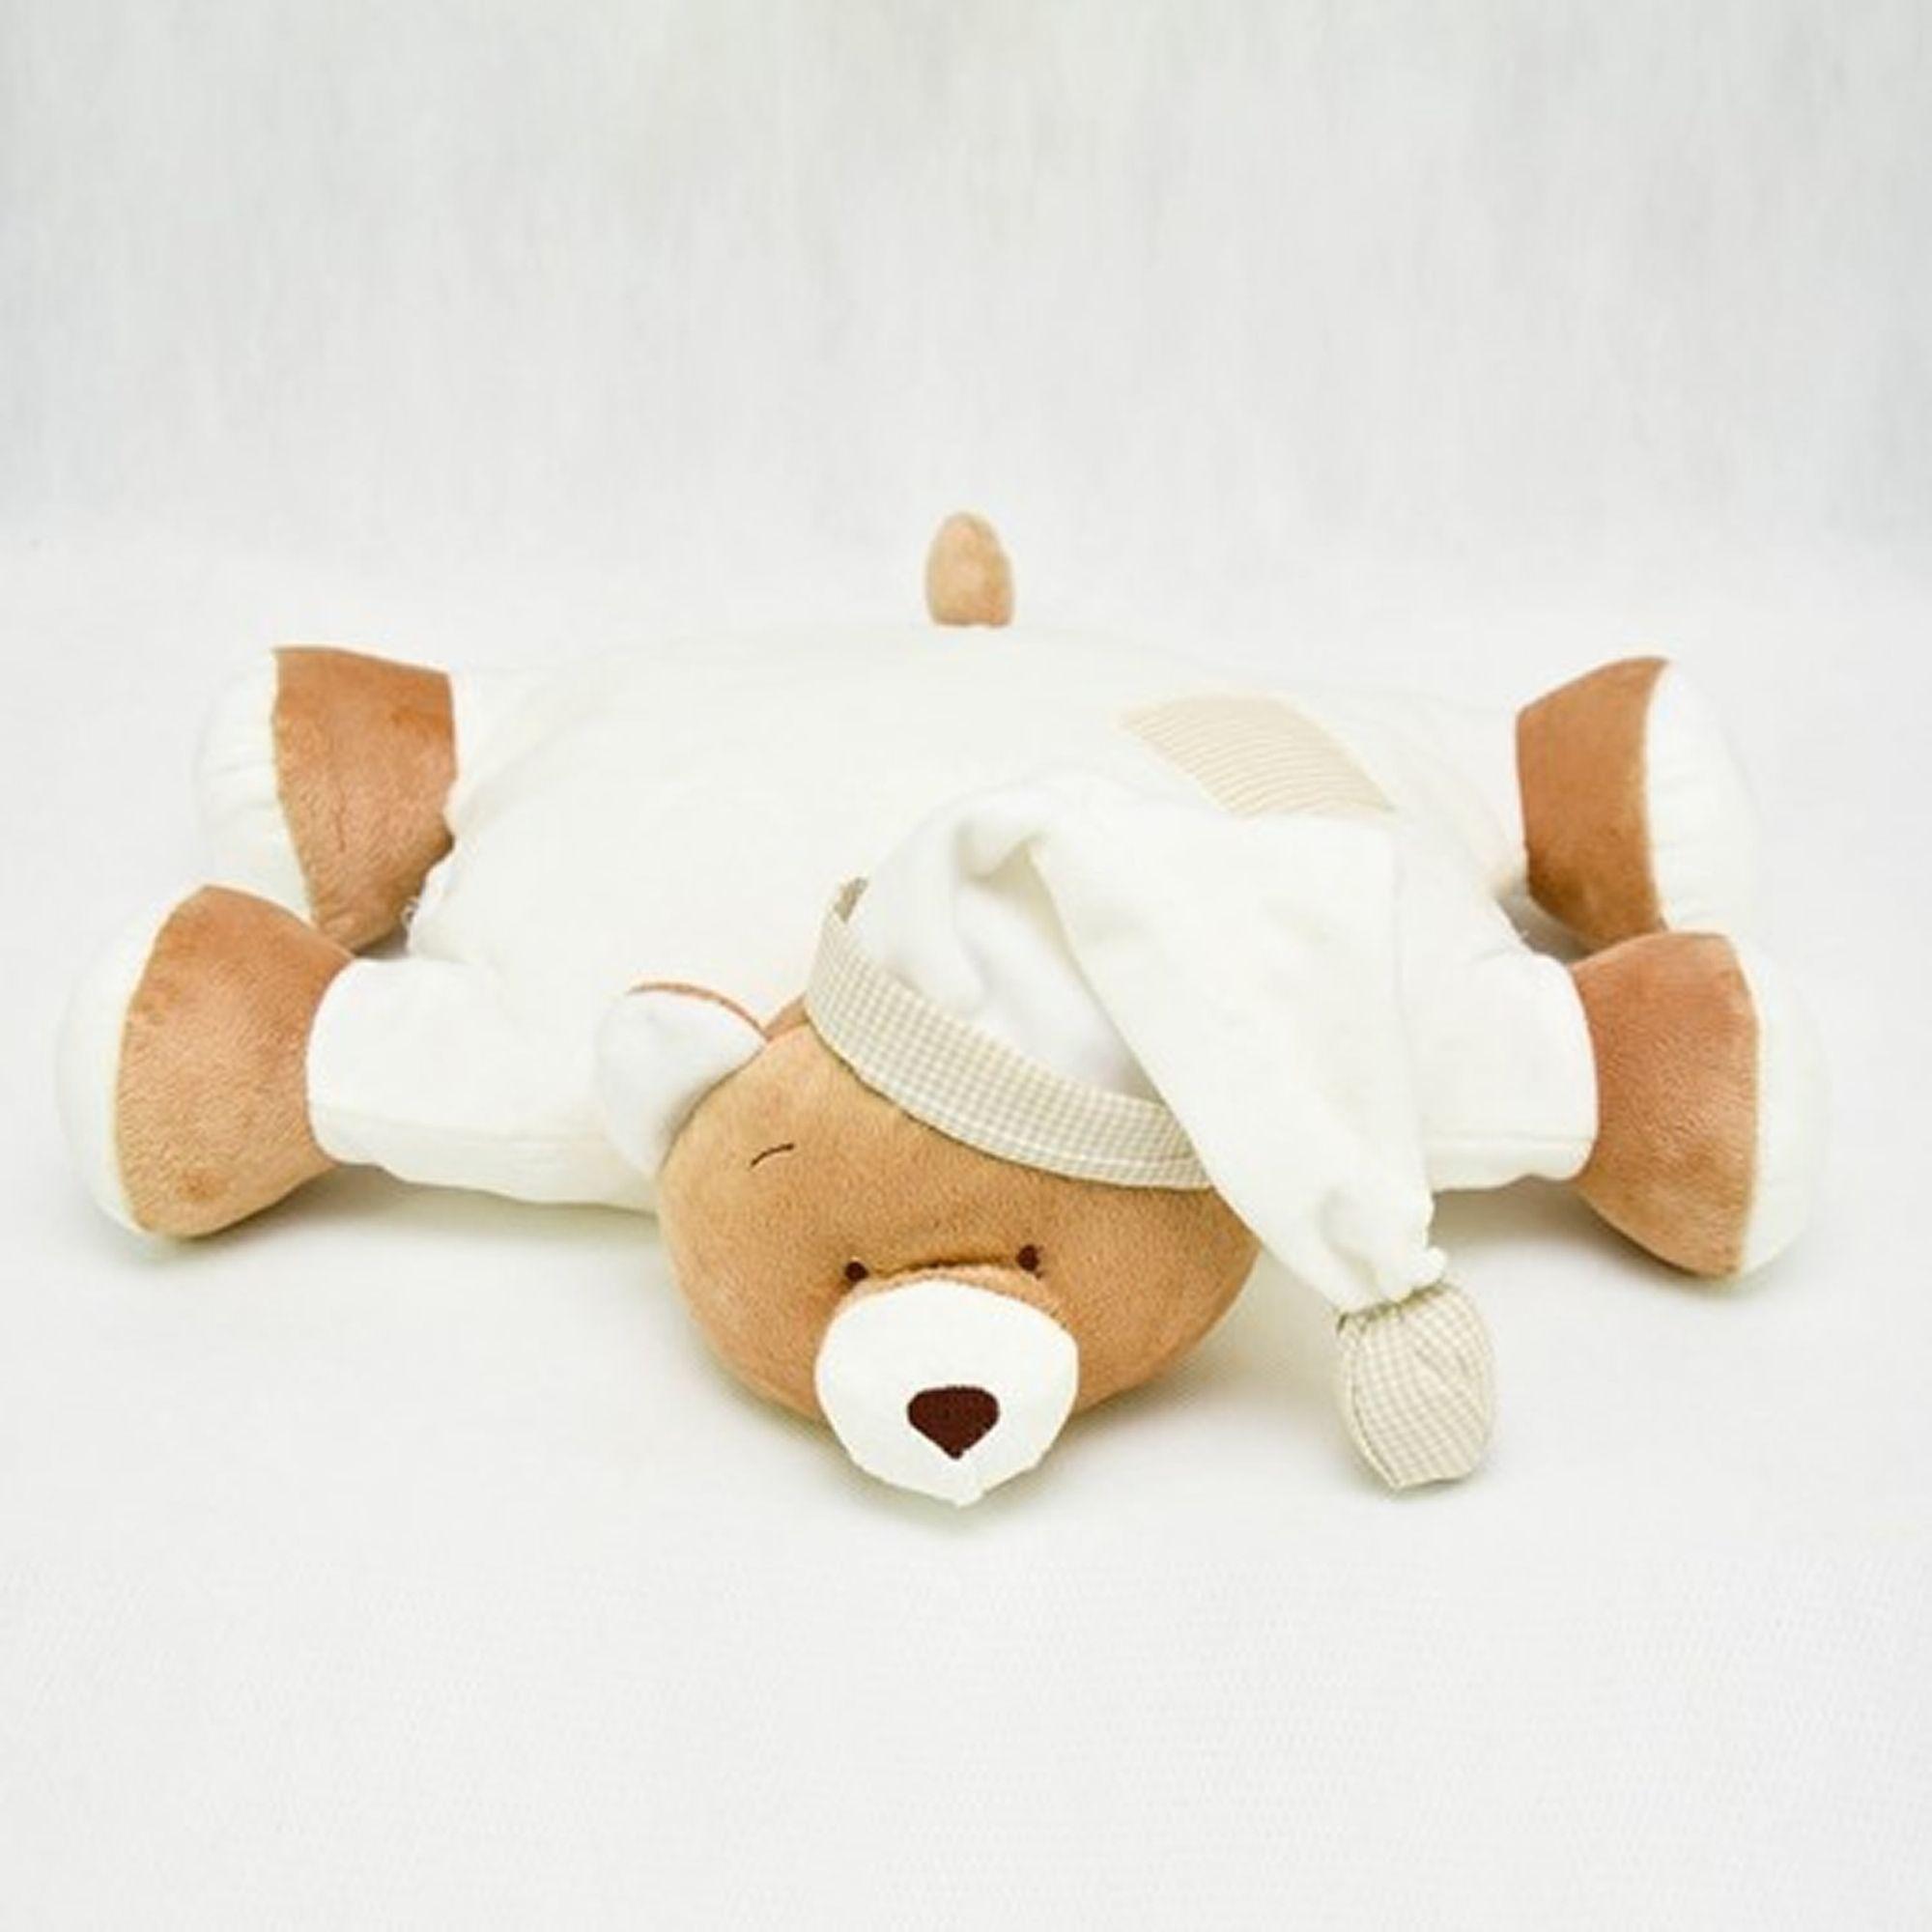 travesseiro-bebe-ursinho-nino-bege-aberto-zip-toys